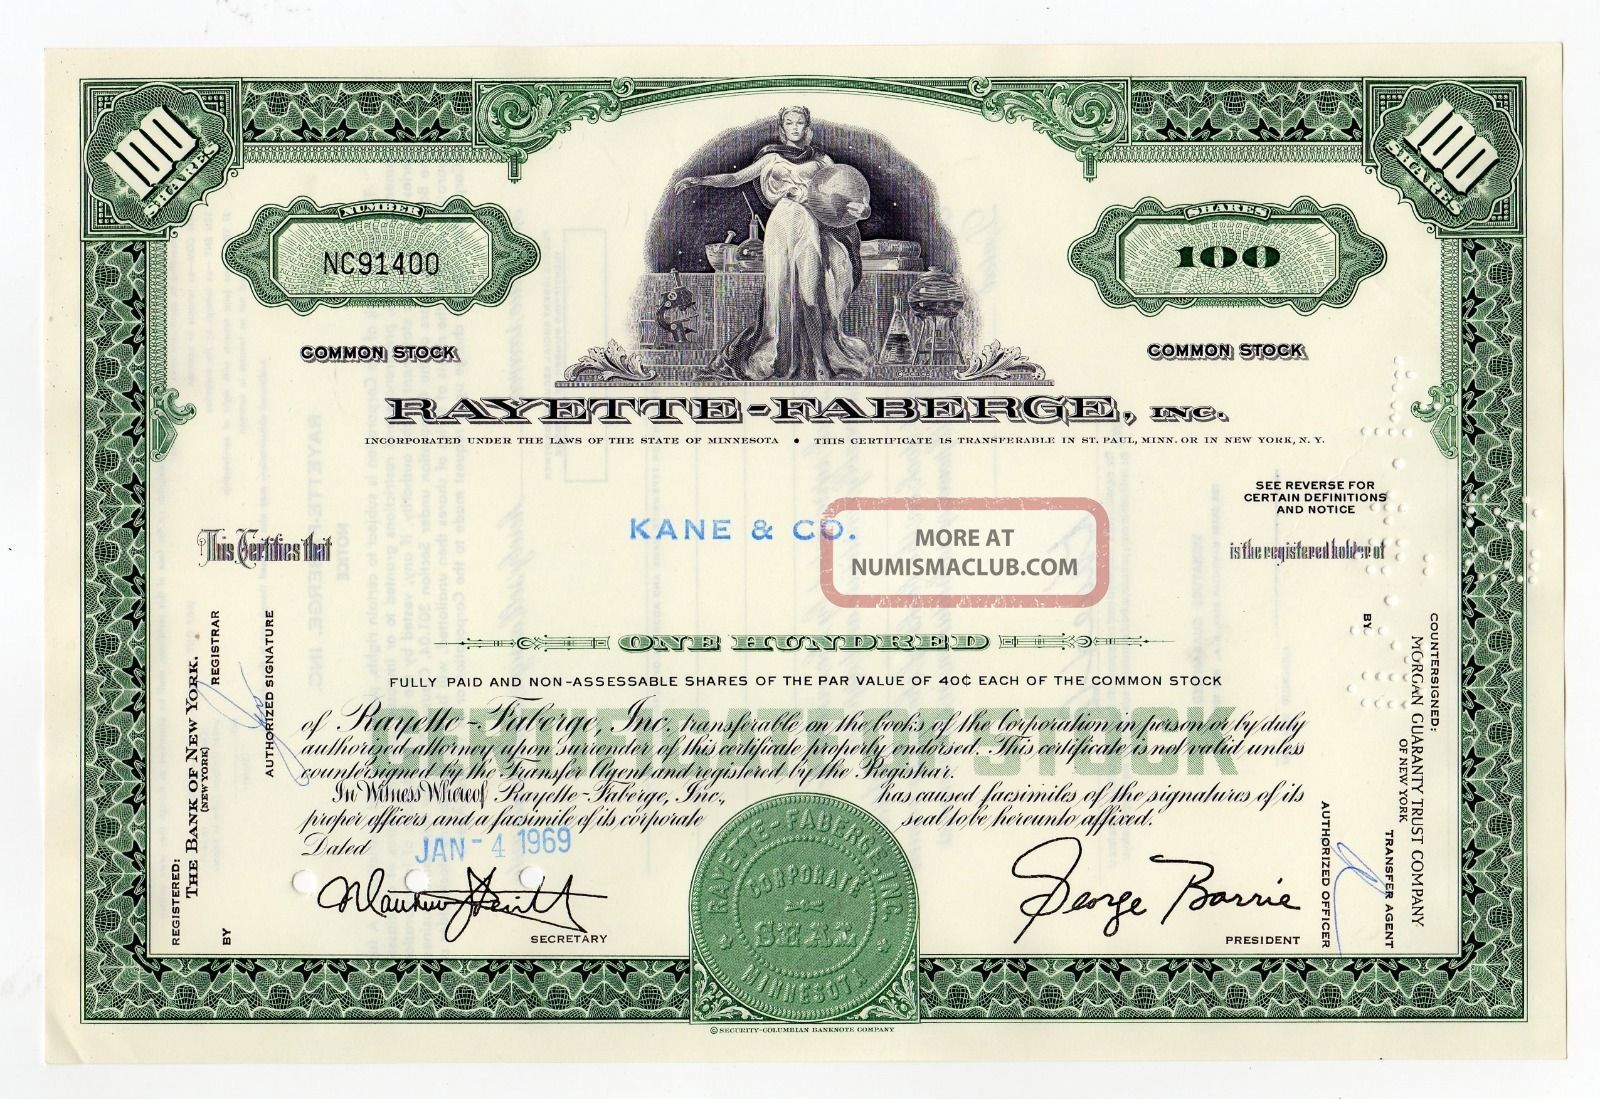 Rayette - Faberge,  Inc.  Stock Certificate Stocks & Bonds, Scripophily photo